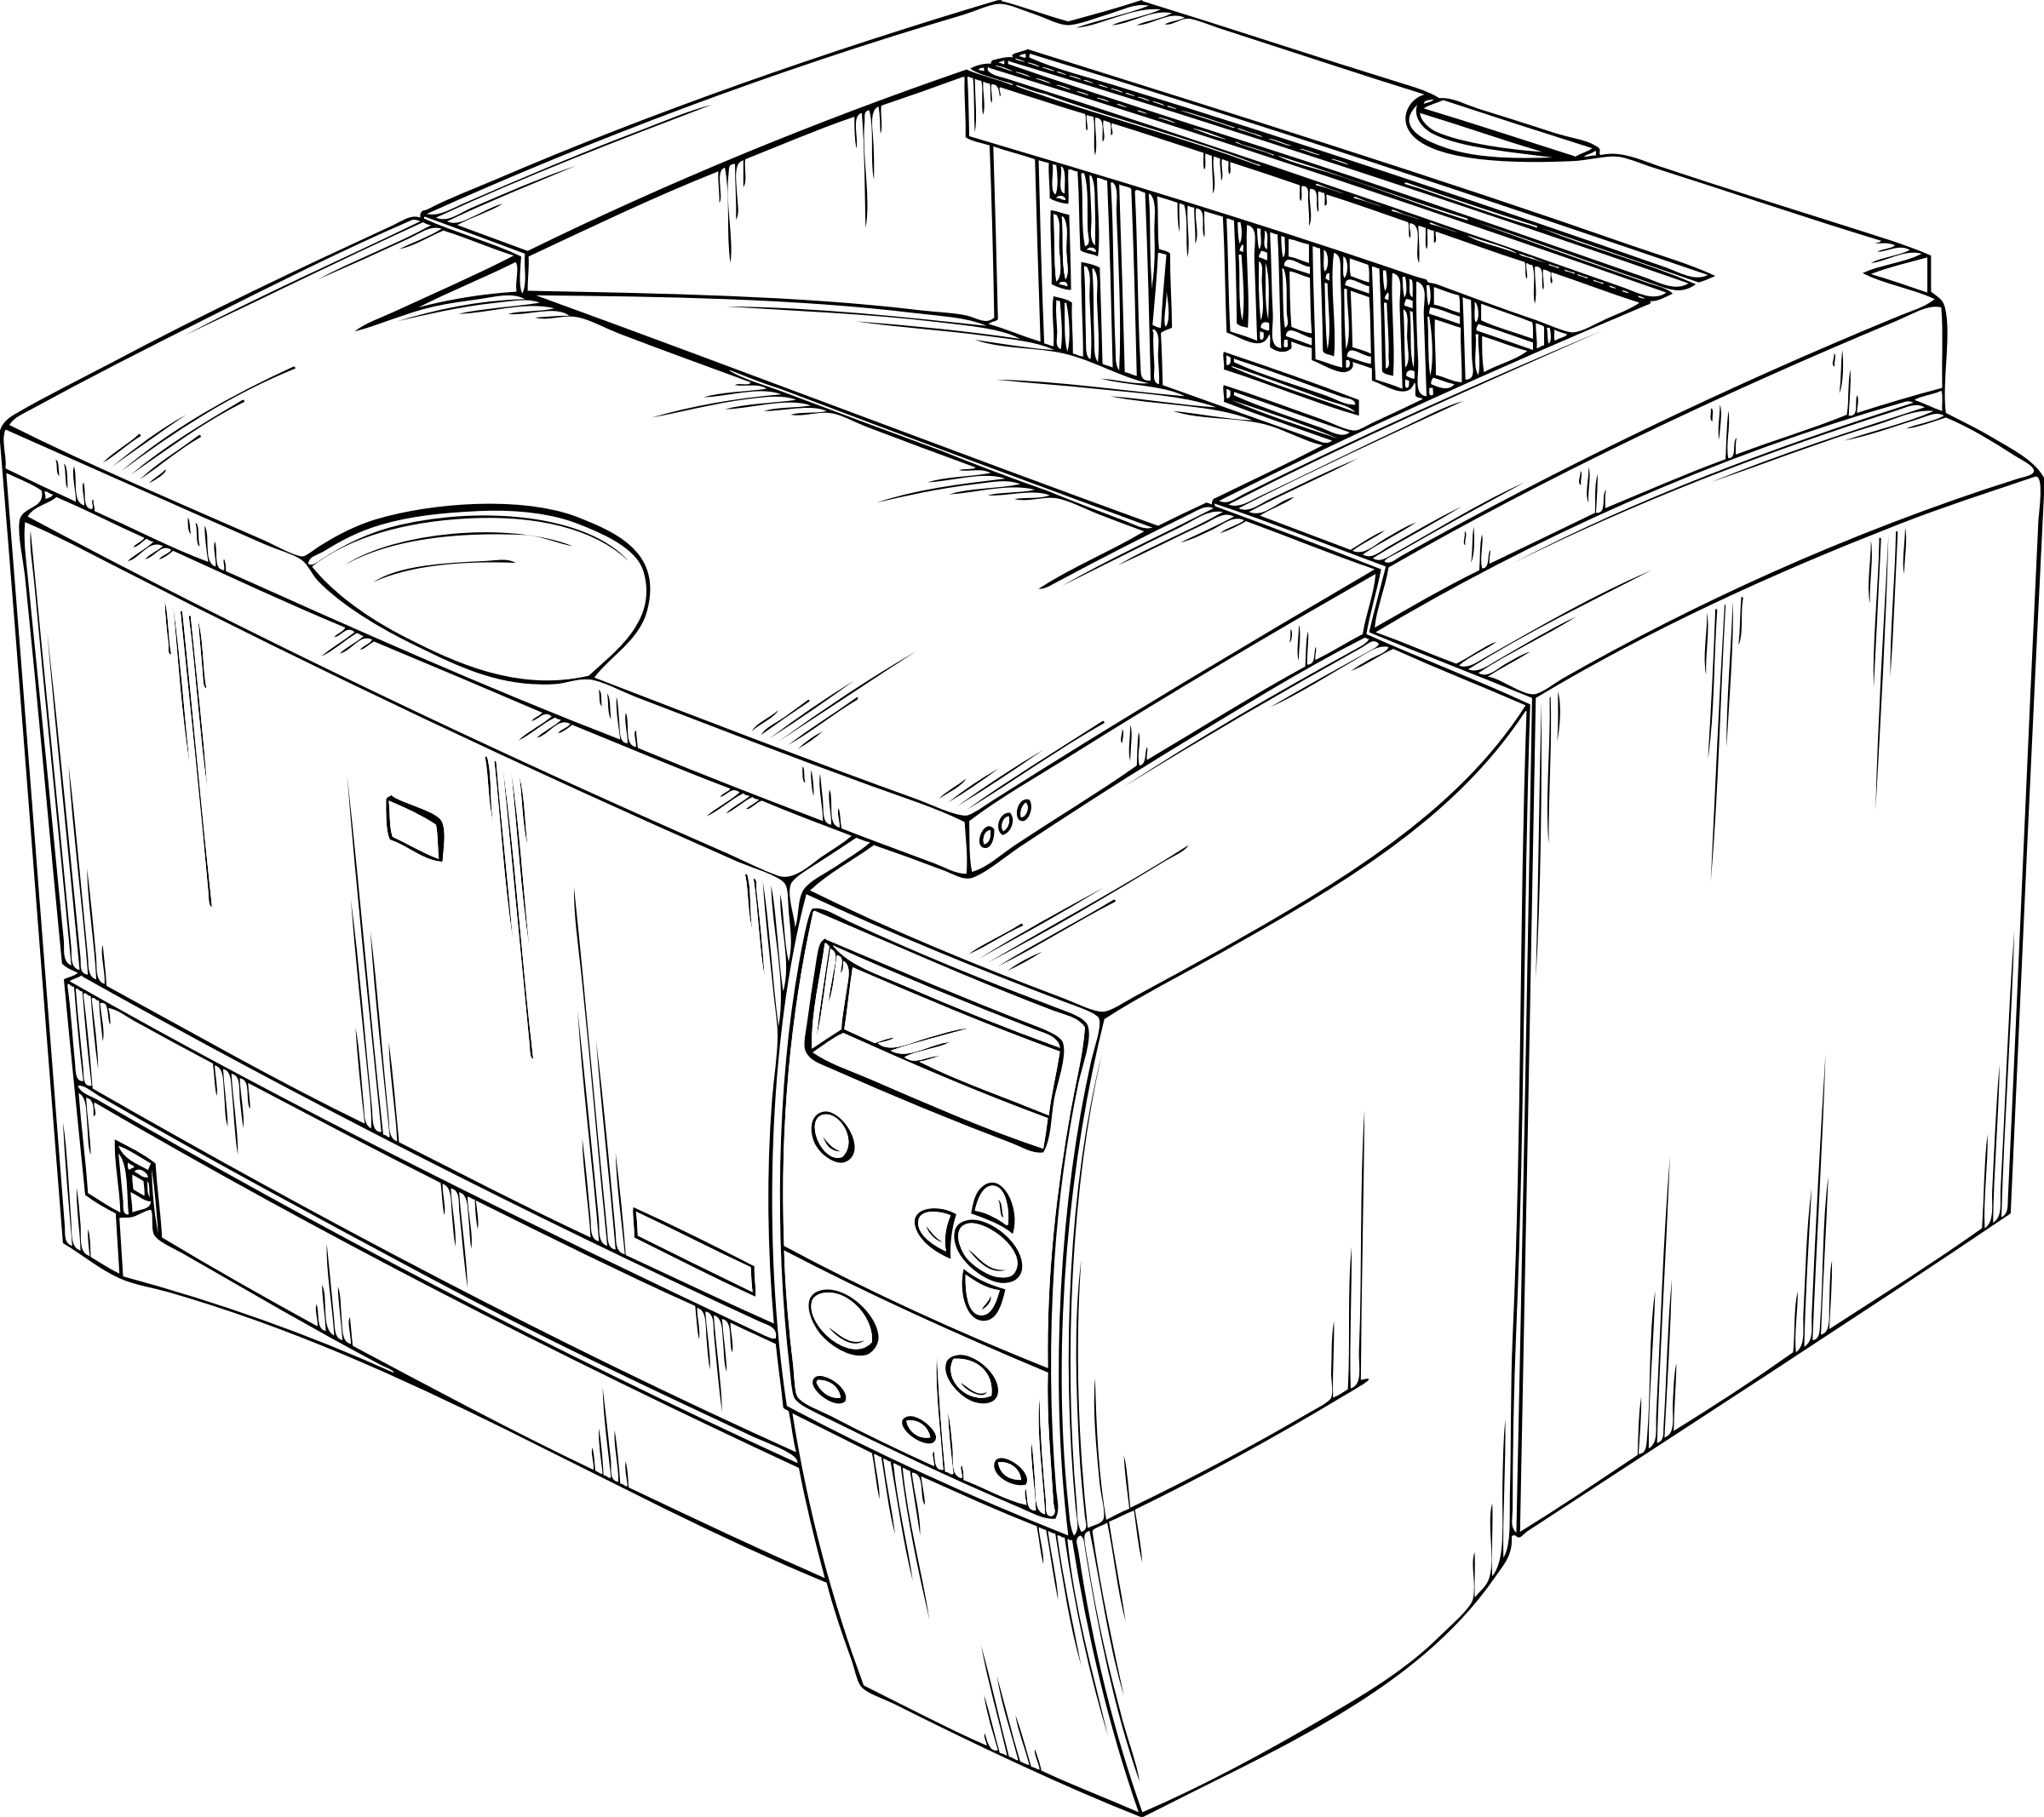 clip art freeuse library Printer Drawing at GetDrawings